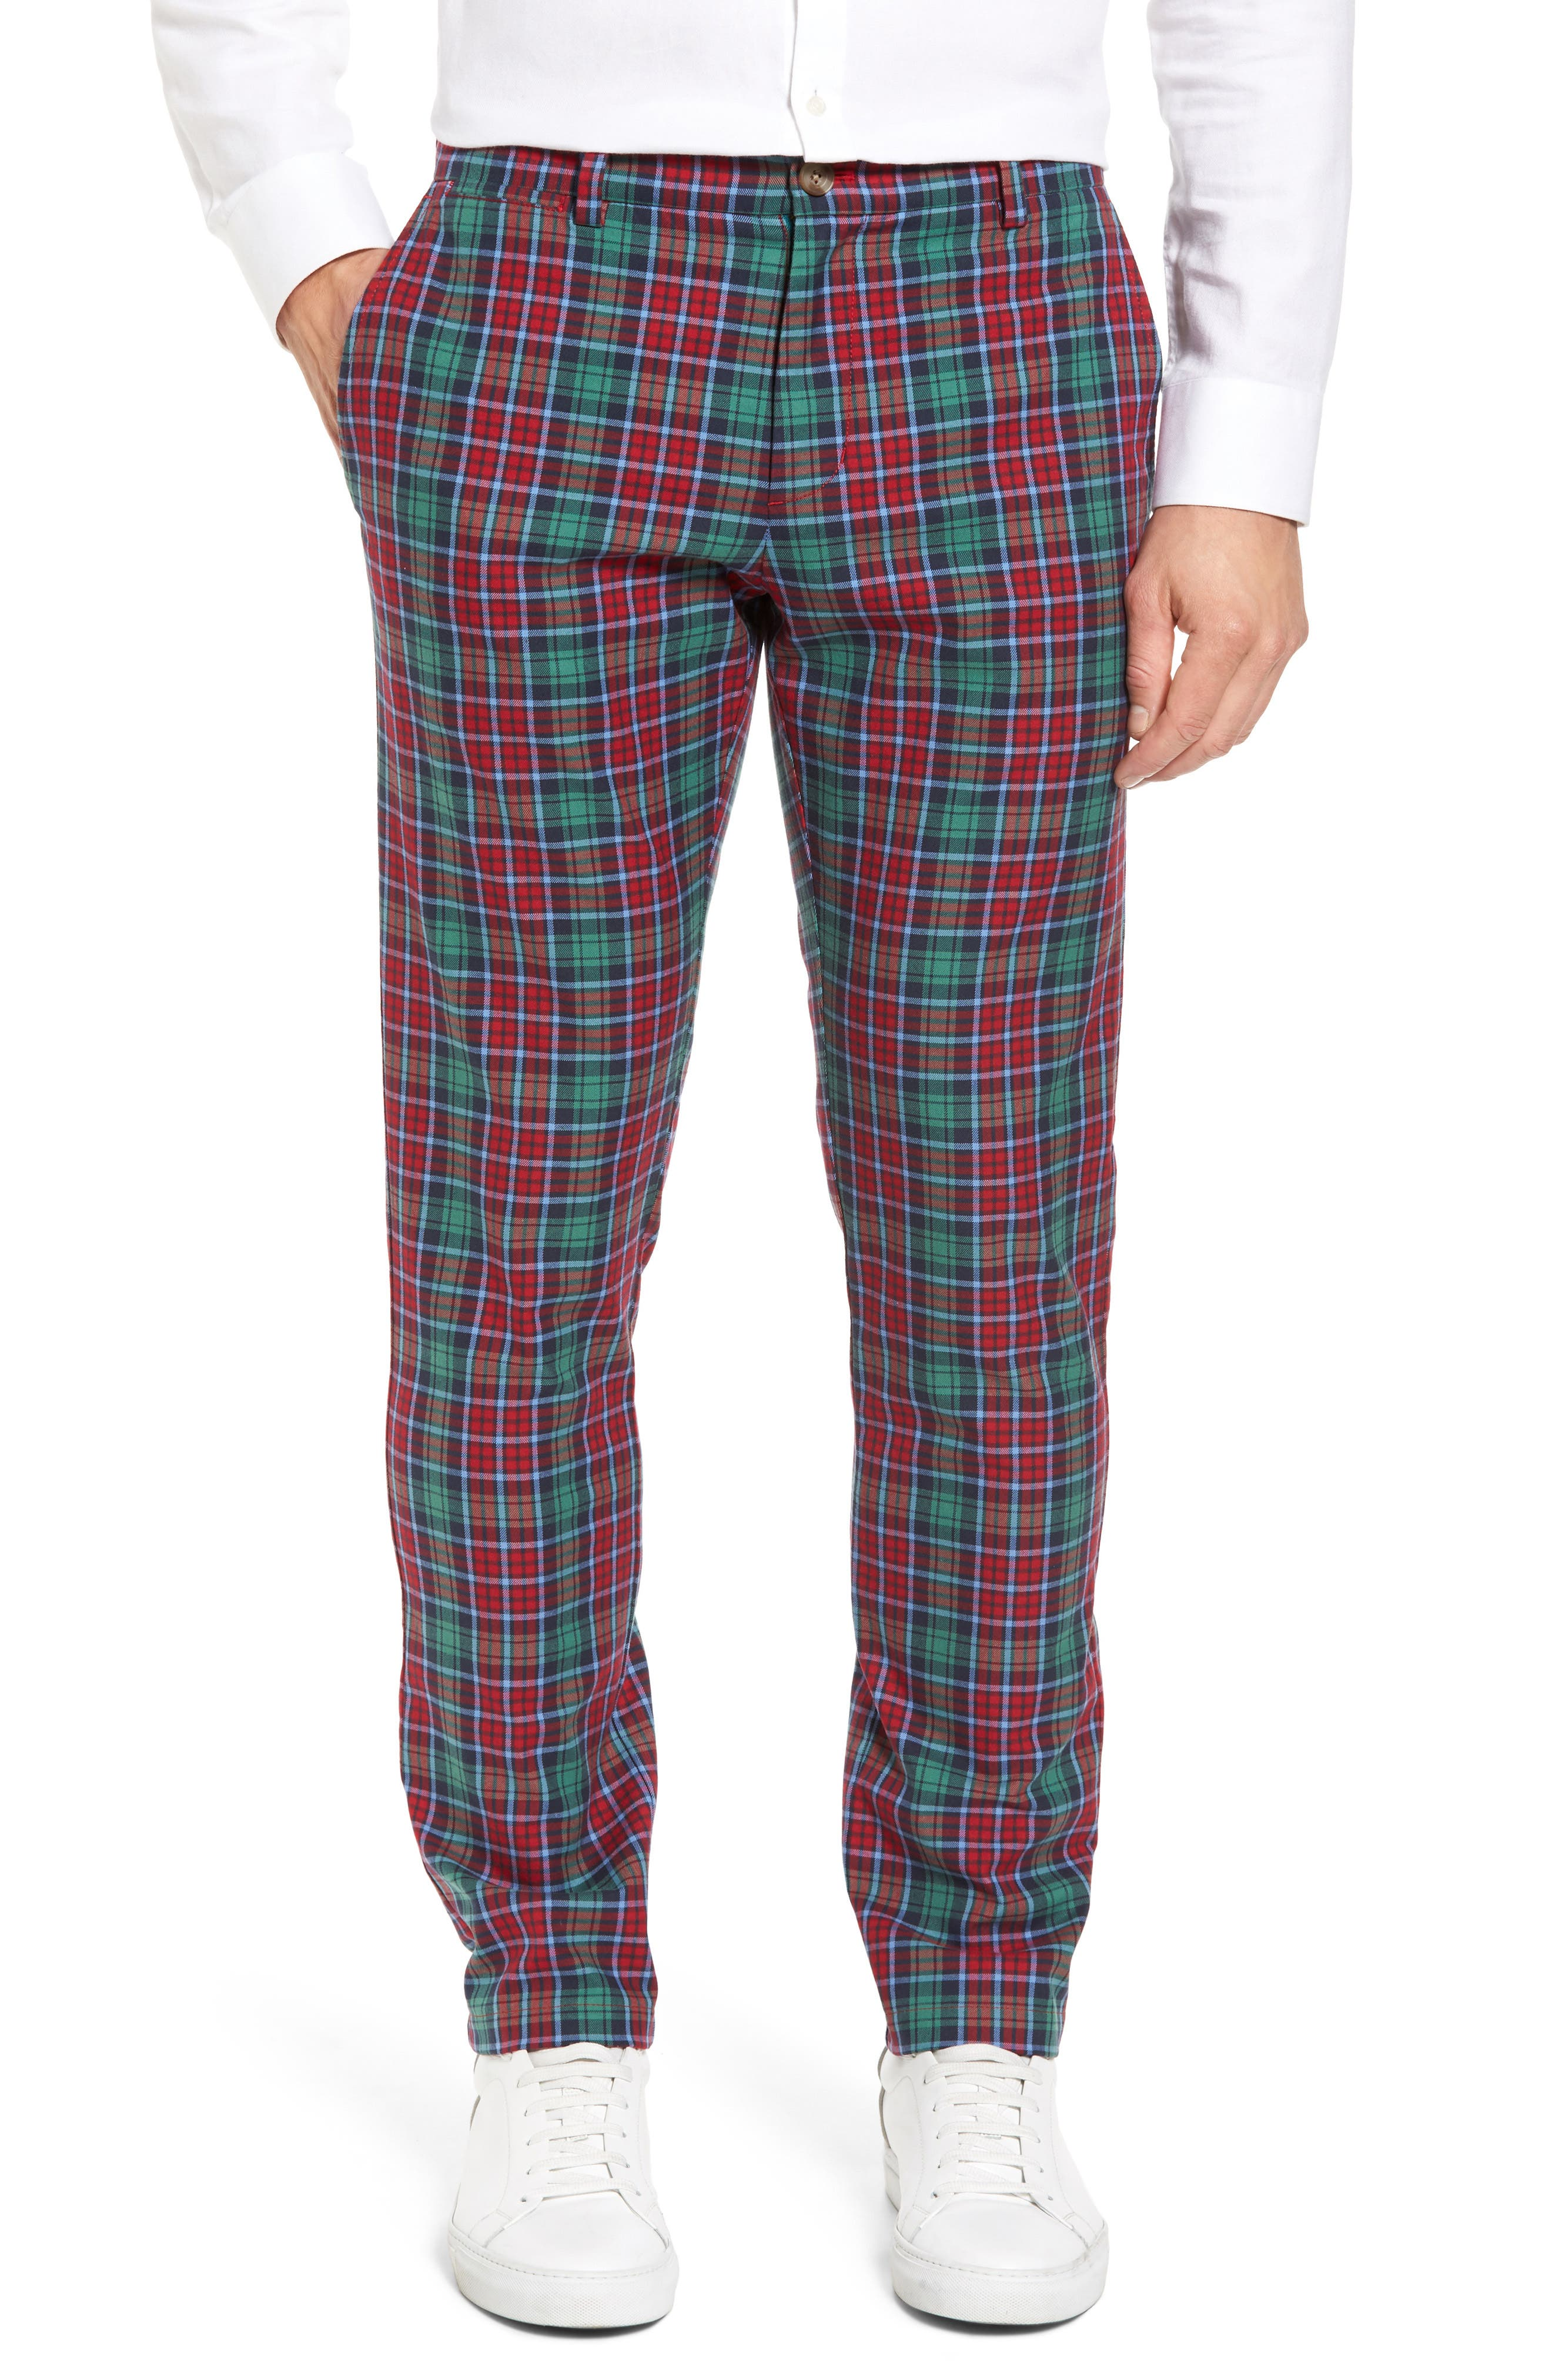 Leddy Park Slim Plaid Pants,                             Main thumbnail 1, color,                             342